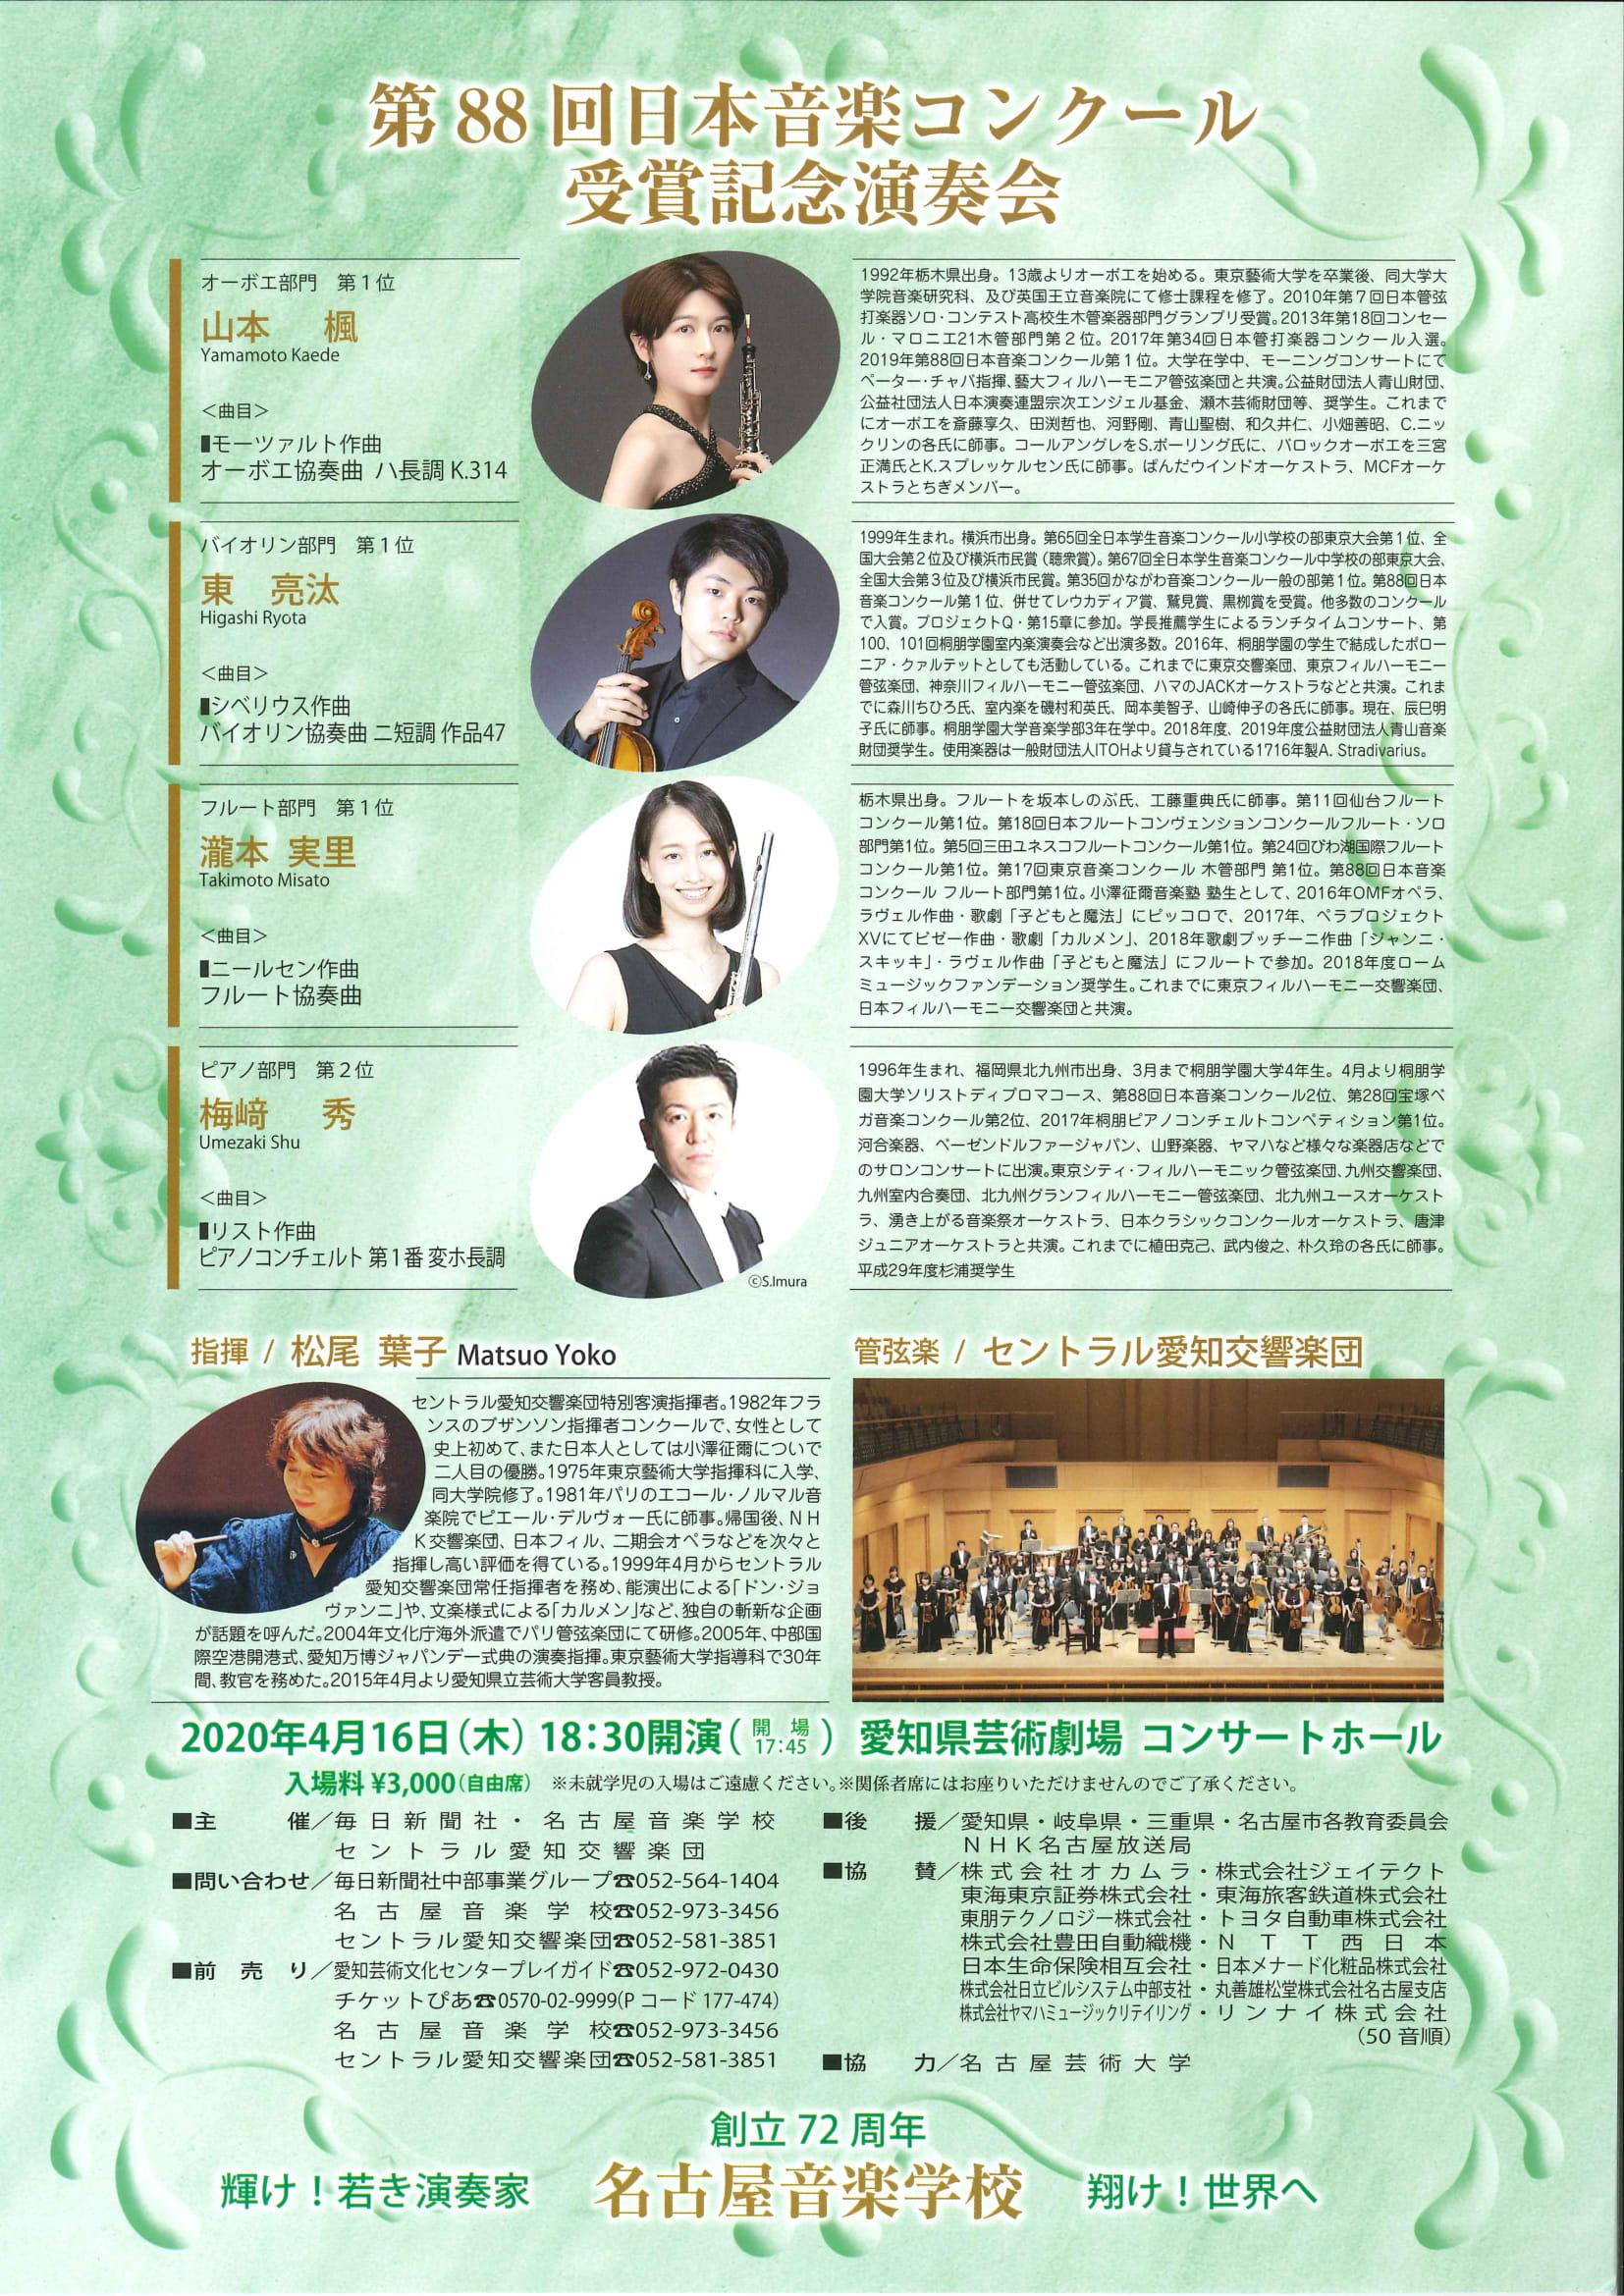 【公演中止】第88回日本音楽コンクール受賞記念演奏会